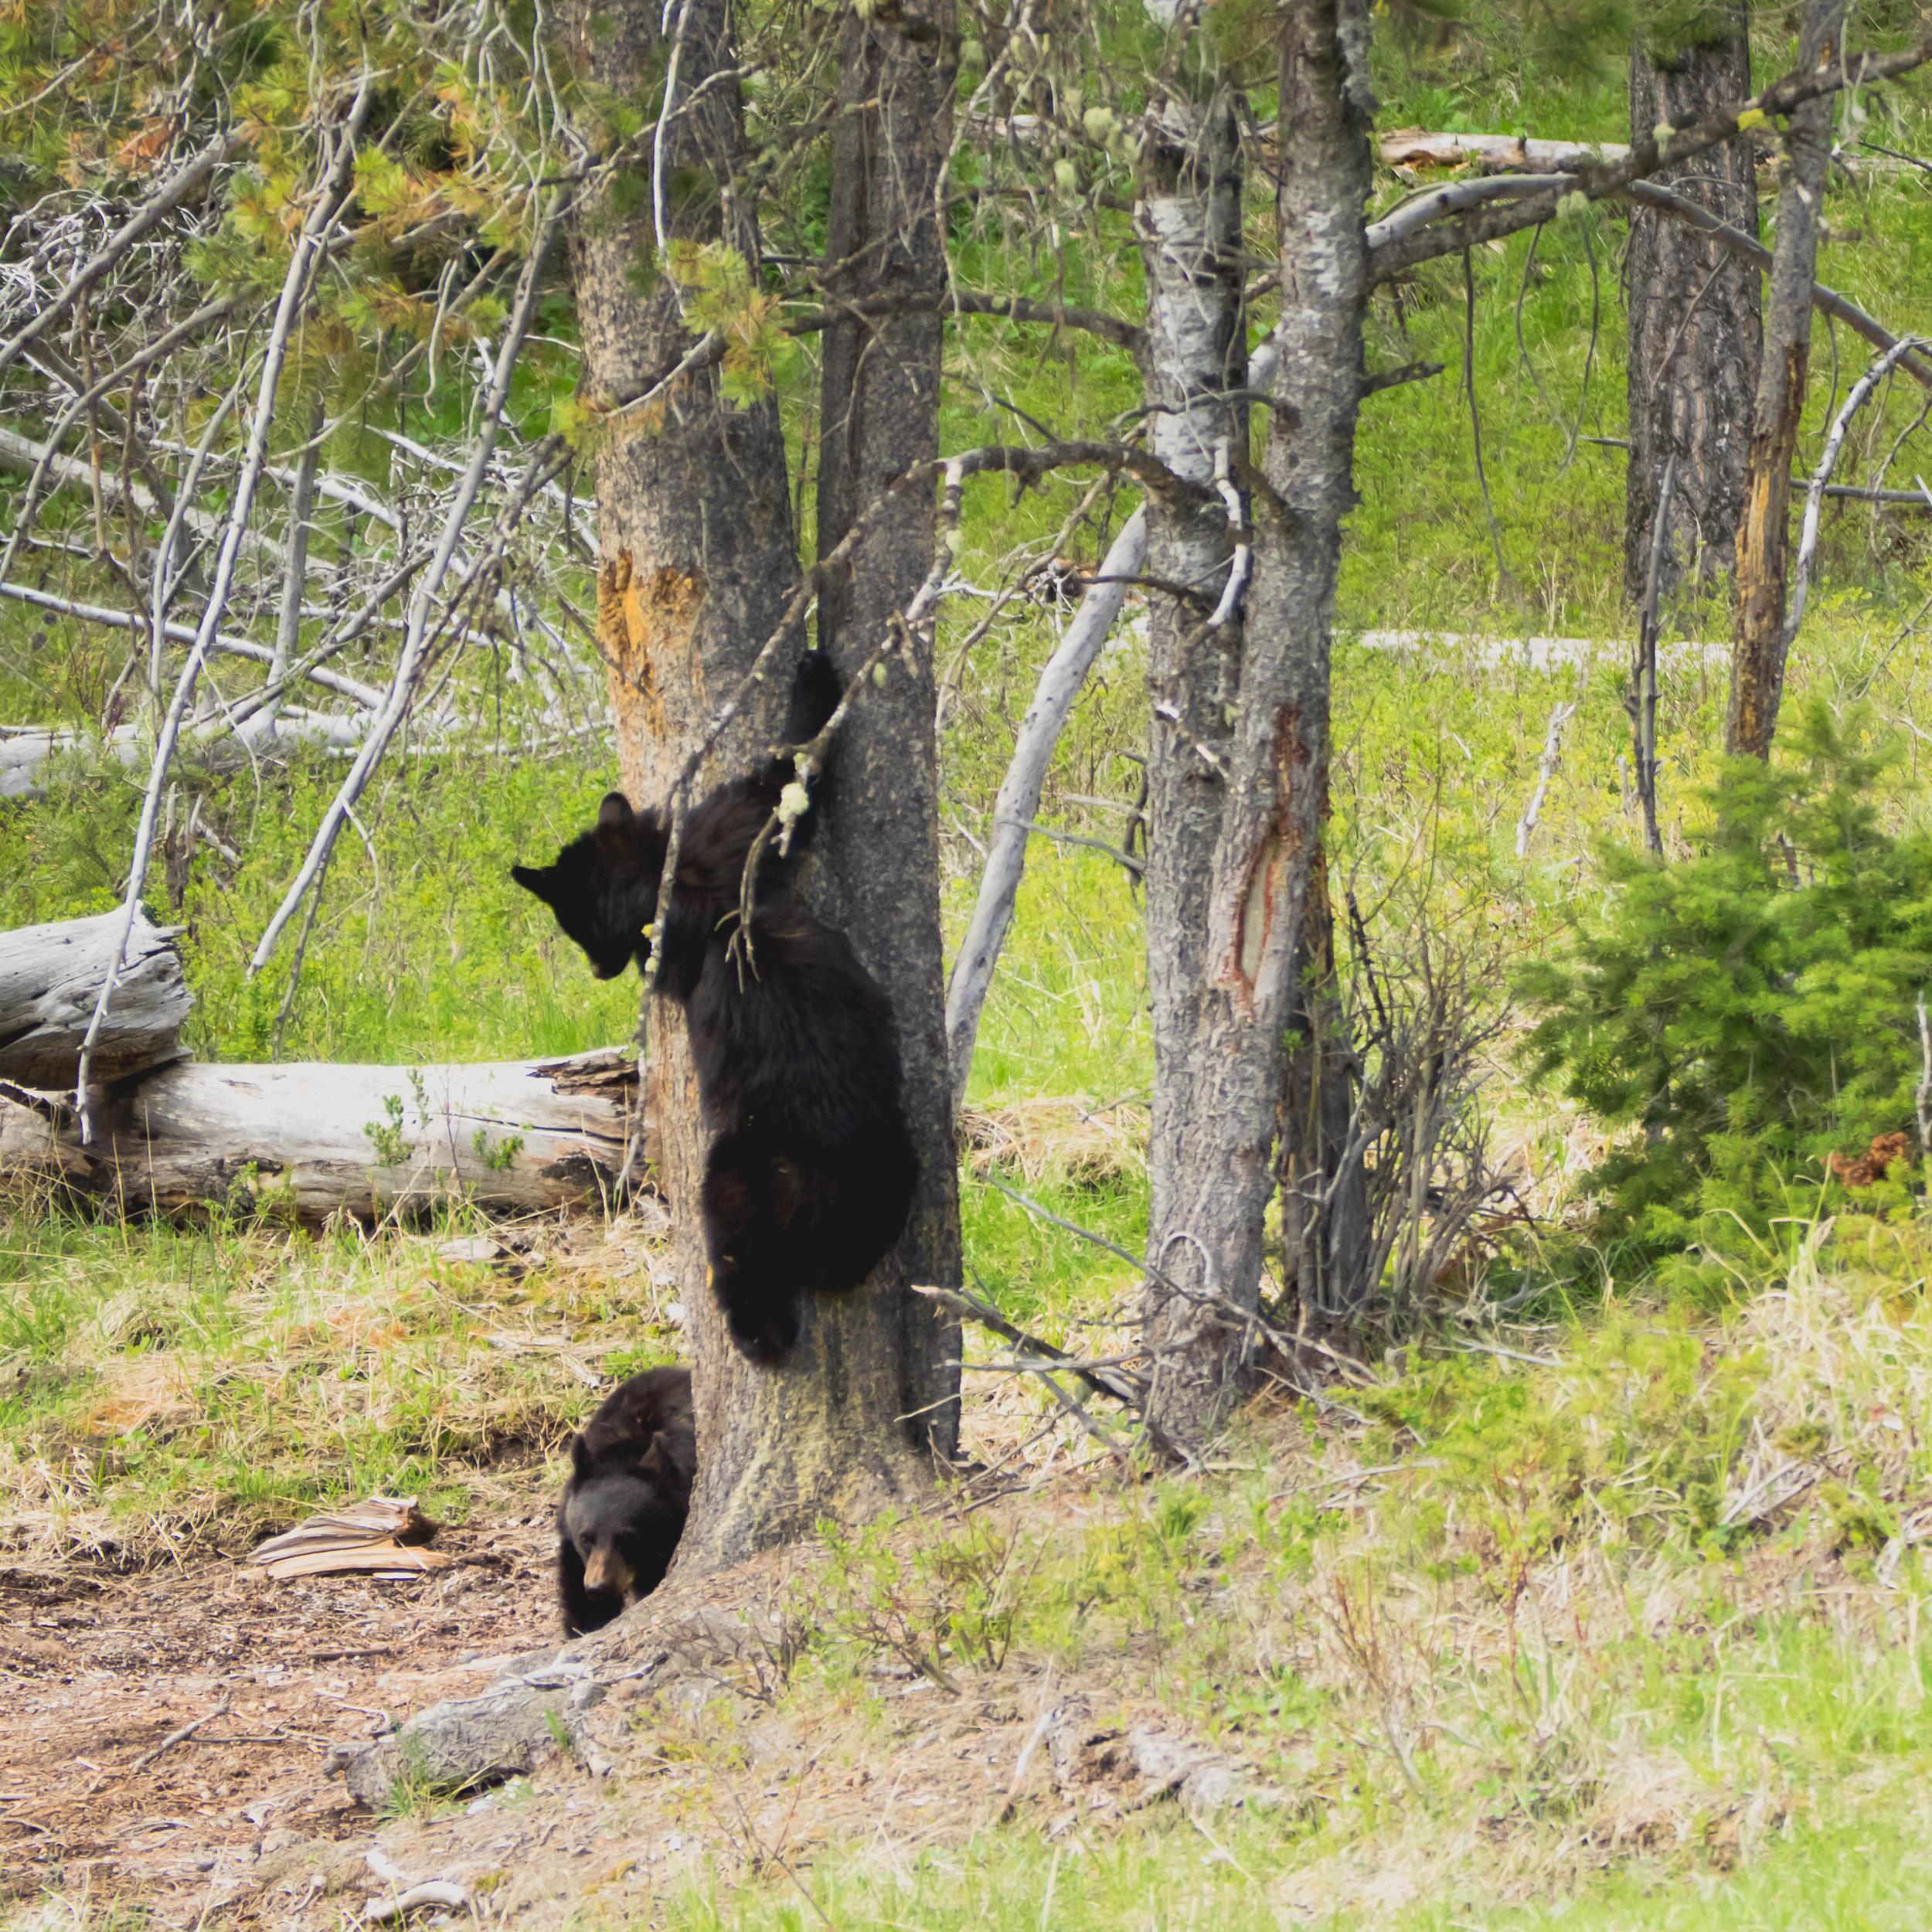 yellowstone-wildlife-safari-127.jpg